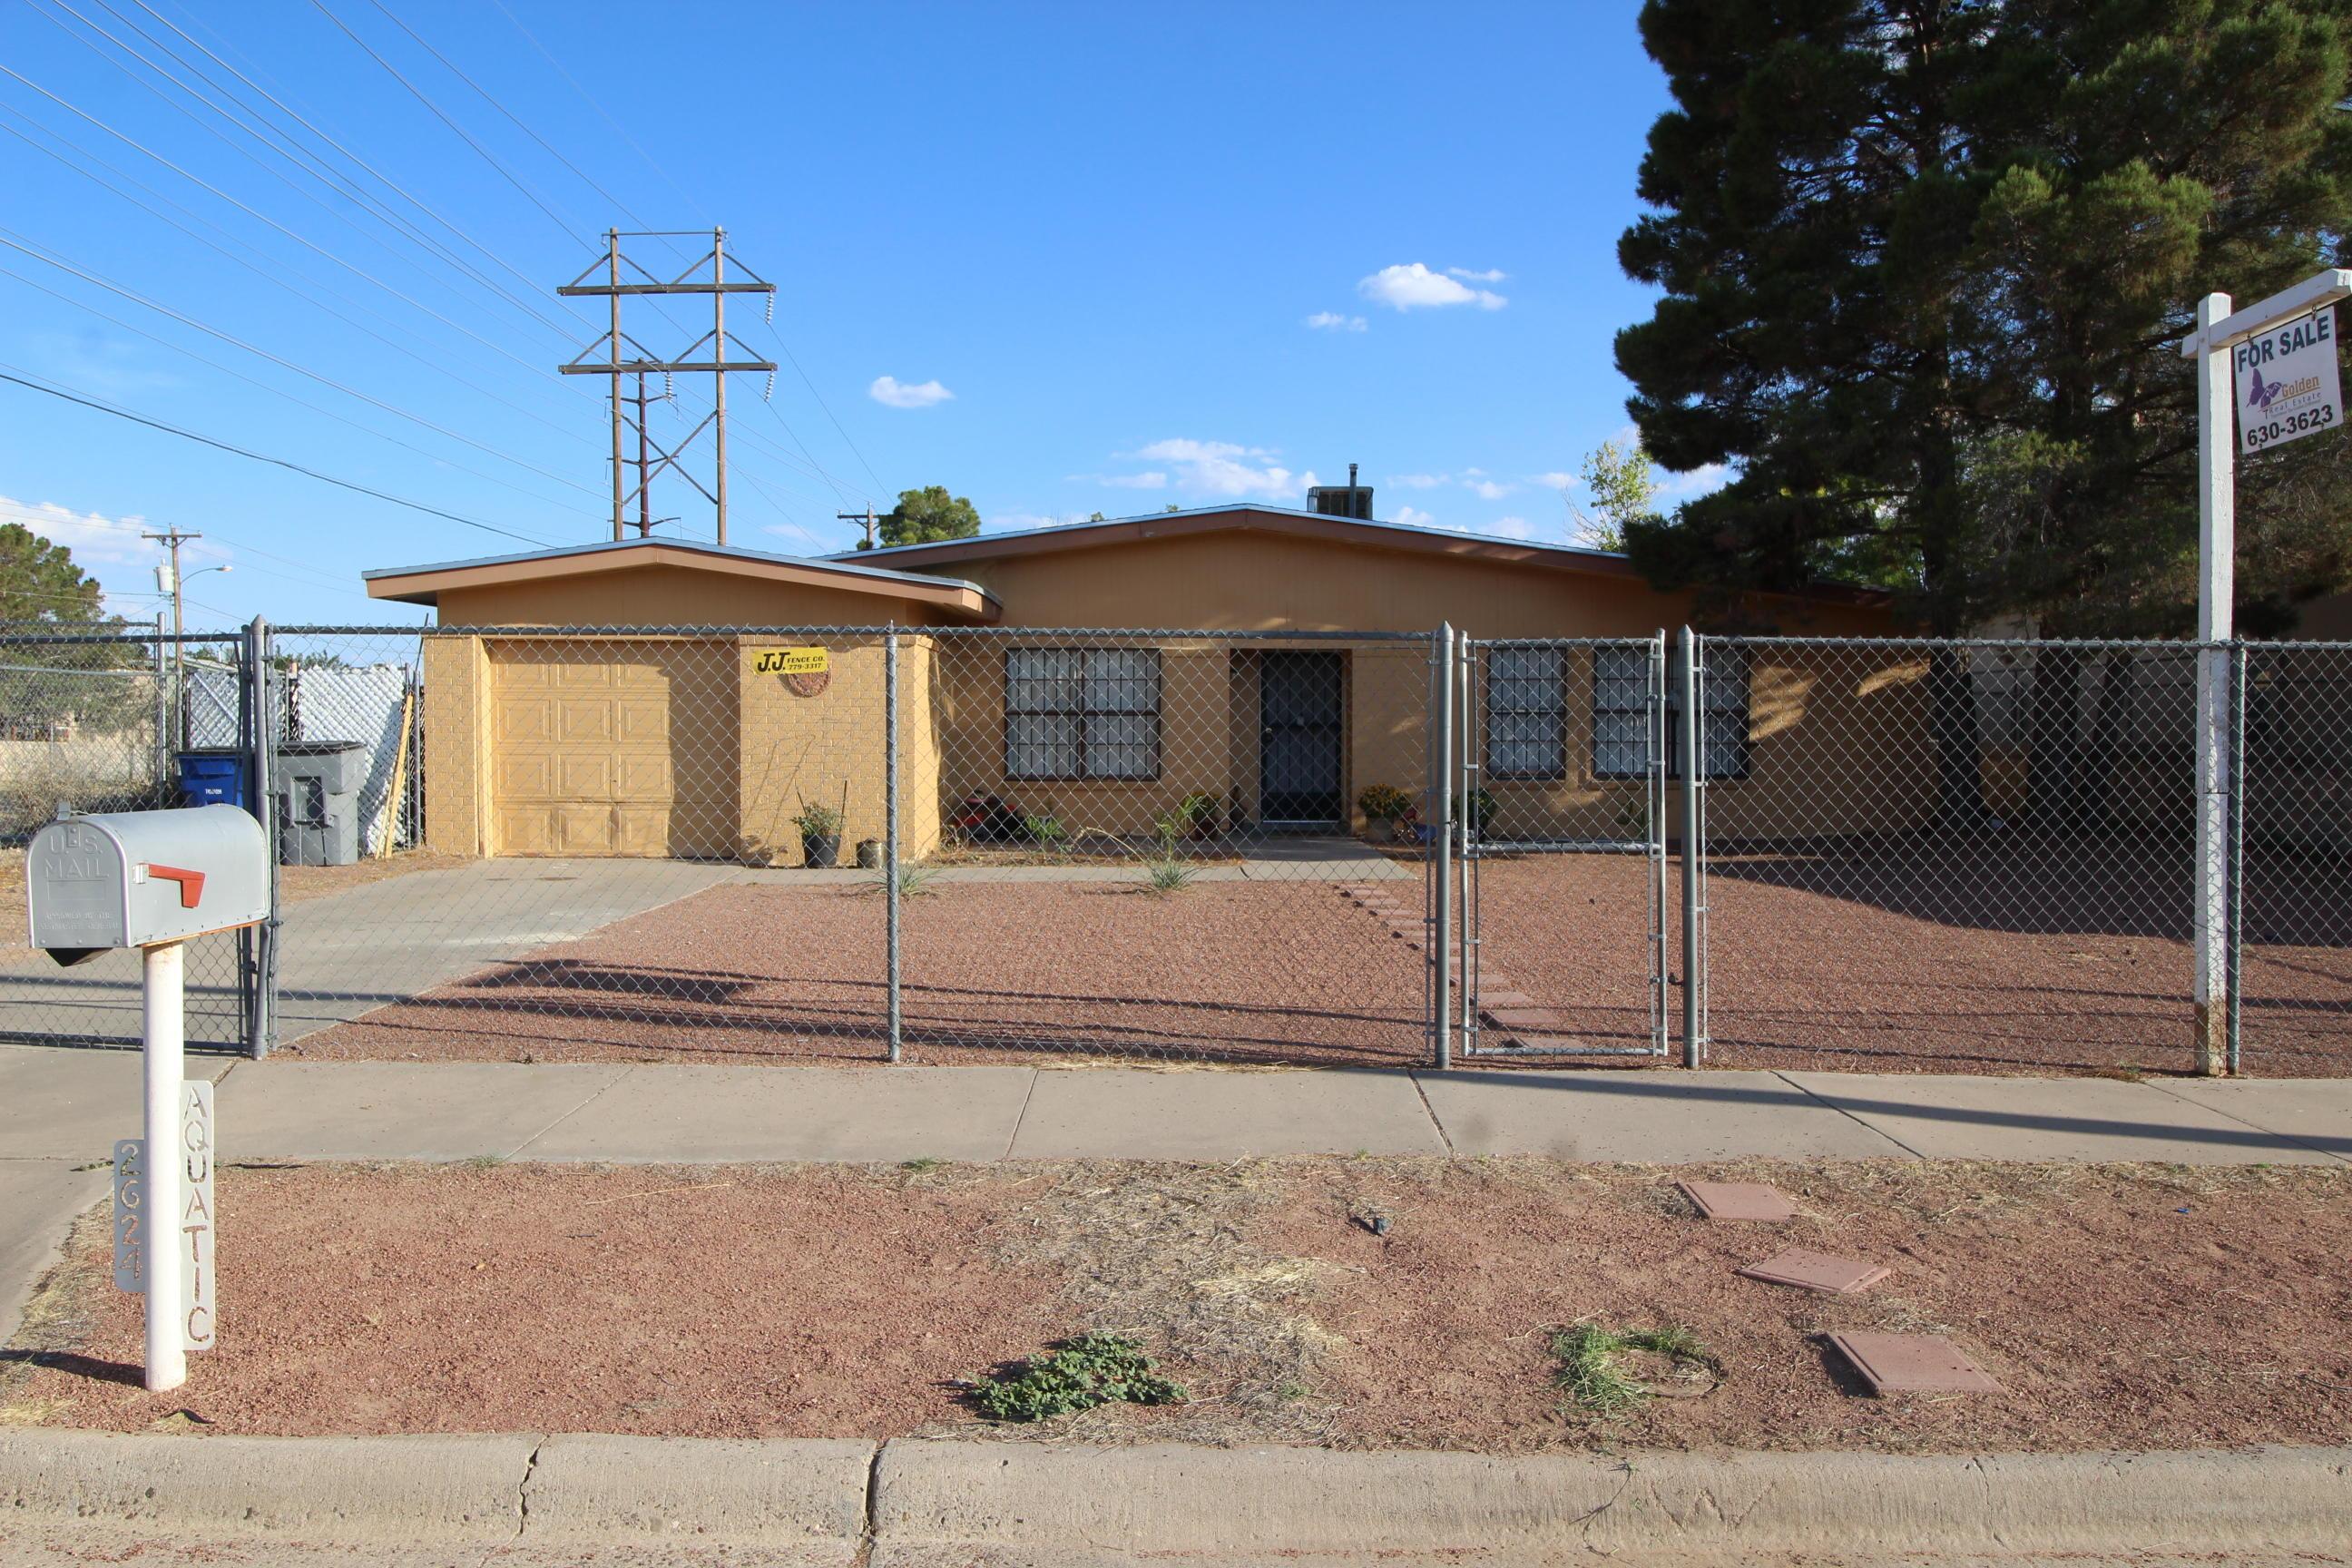 2624 AQUATIC, El Paso, Texas 79936, 3 Bedrooms Bedrooms, ,2 BathroomsBathrooms,Residential,For sale,AQUATIC,811116